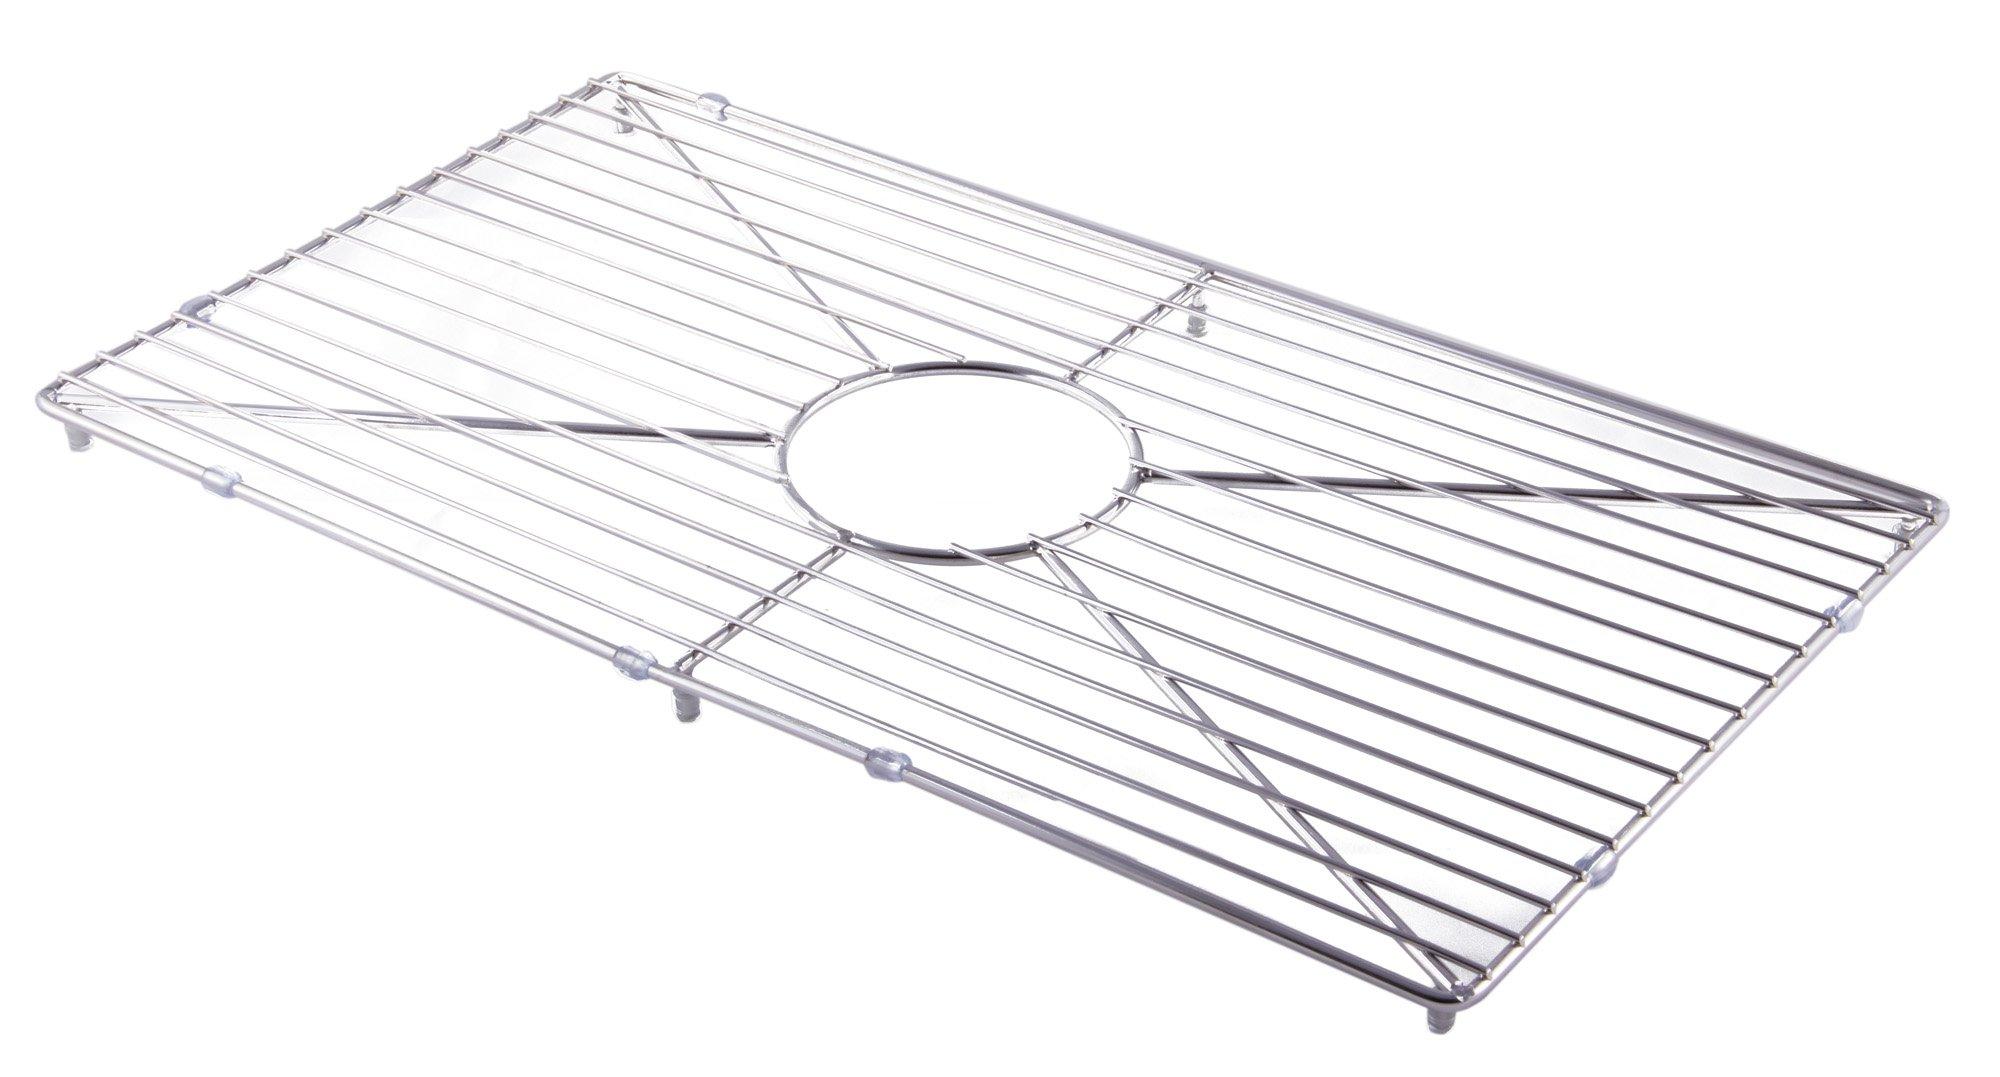 ALFI brand ABGR3018 Solid Kitchen Sink Grid, Stainless Steel